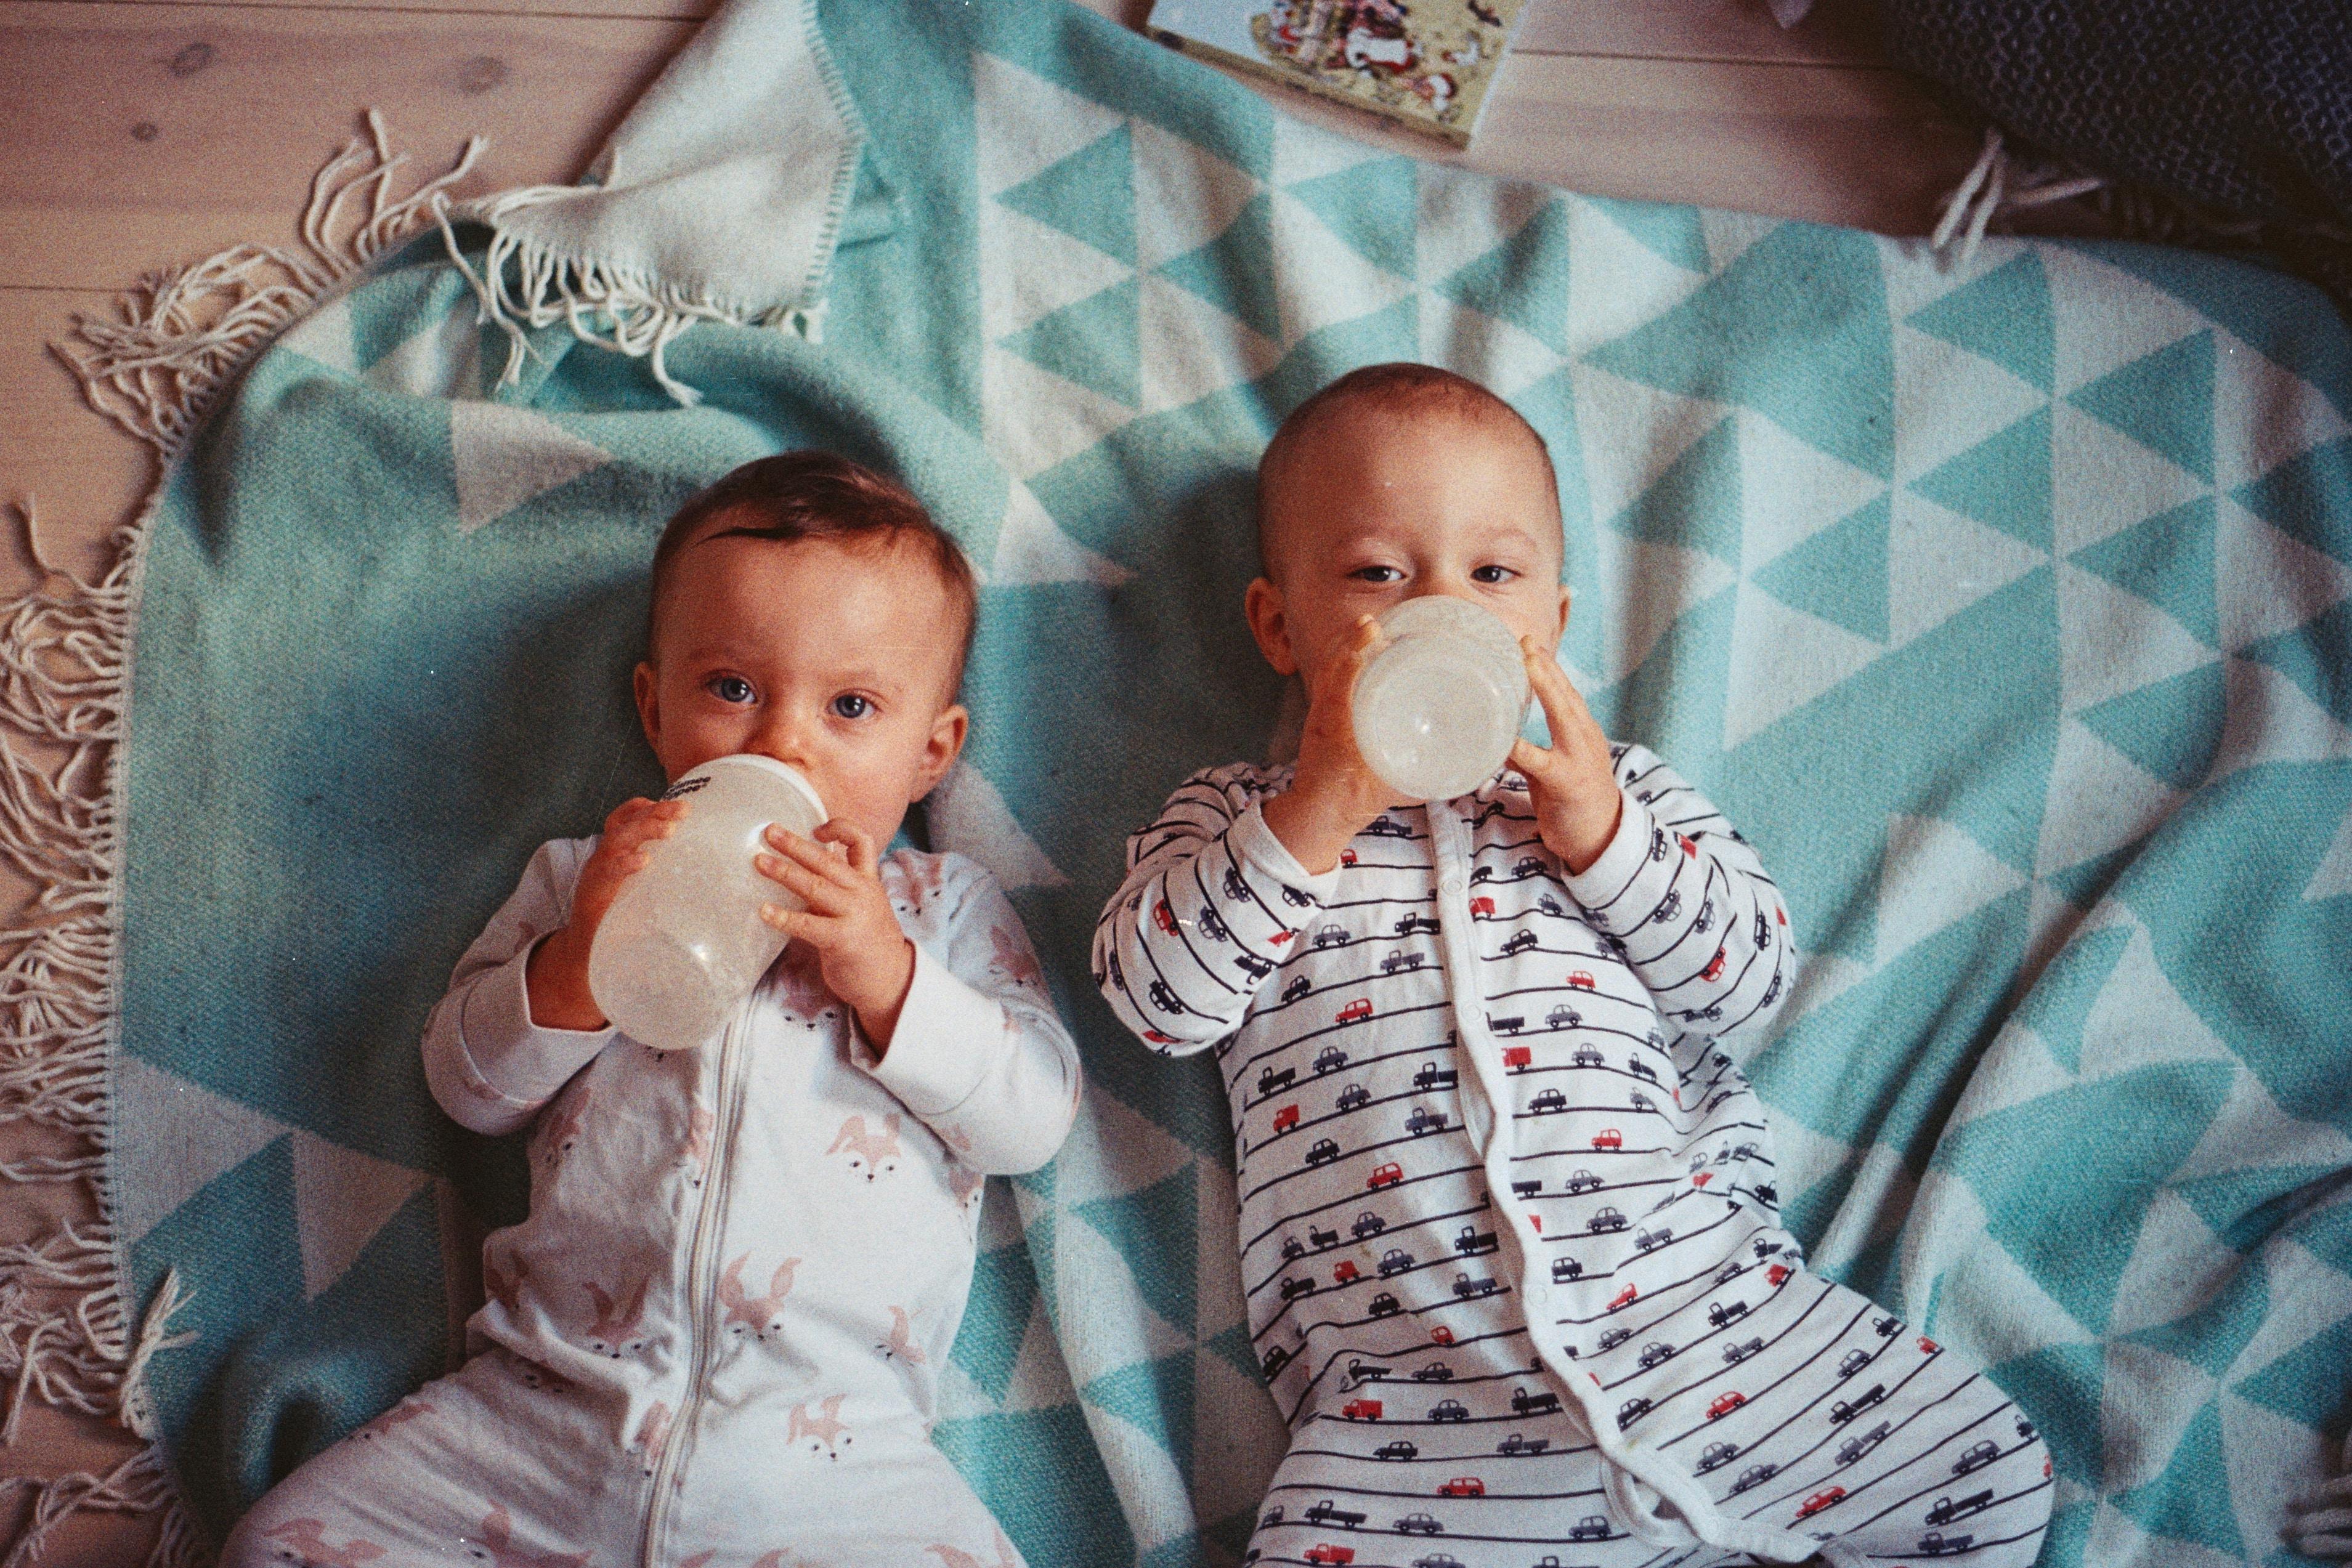 Preferenza 15 frasi di auguri per la nascita dei gemelli | Le Mamme BT42